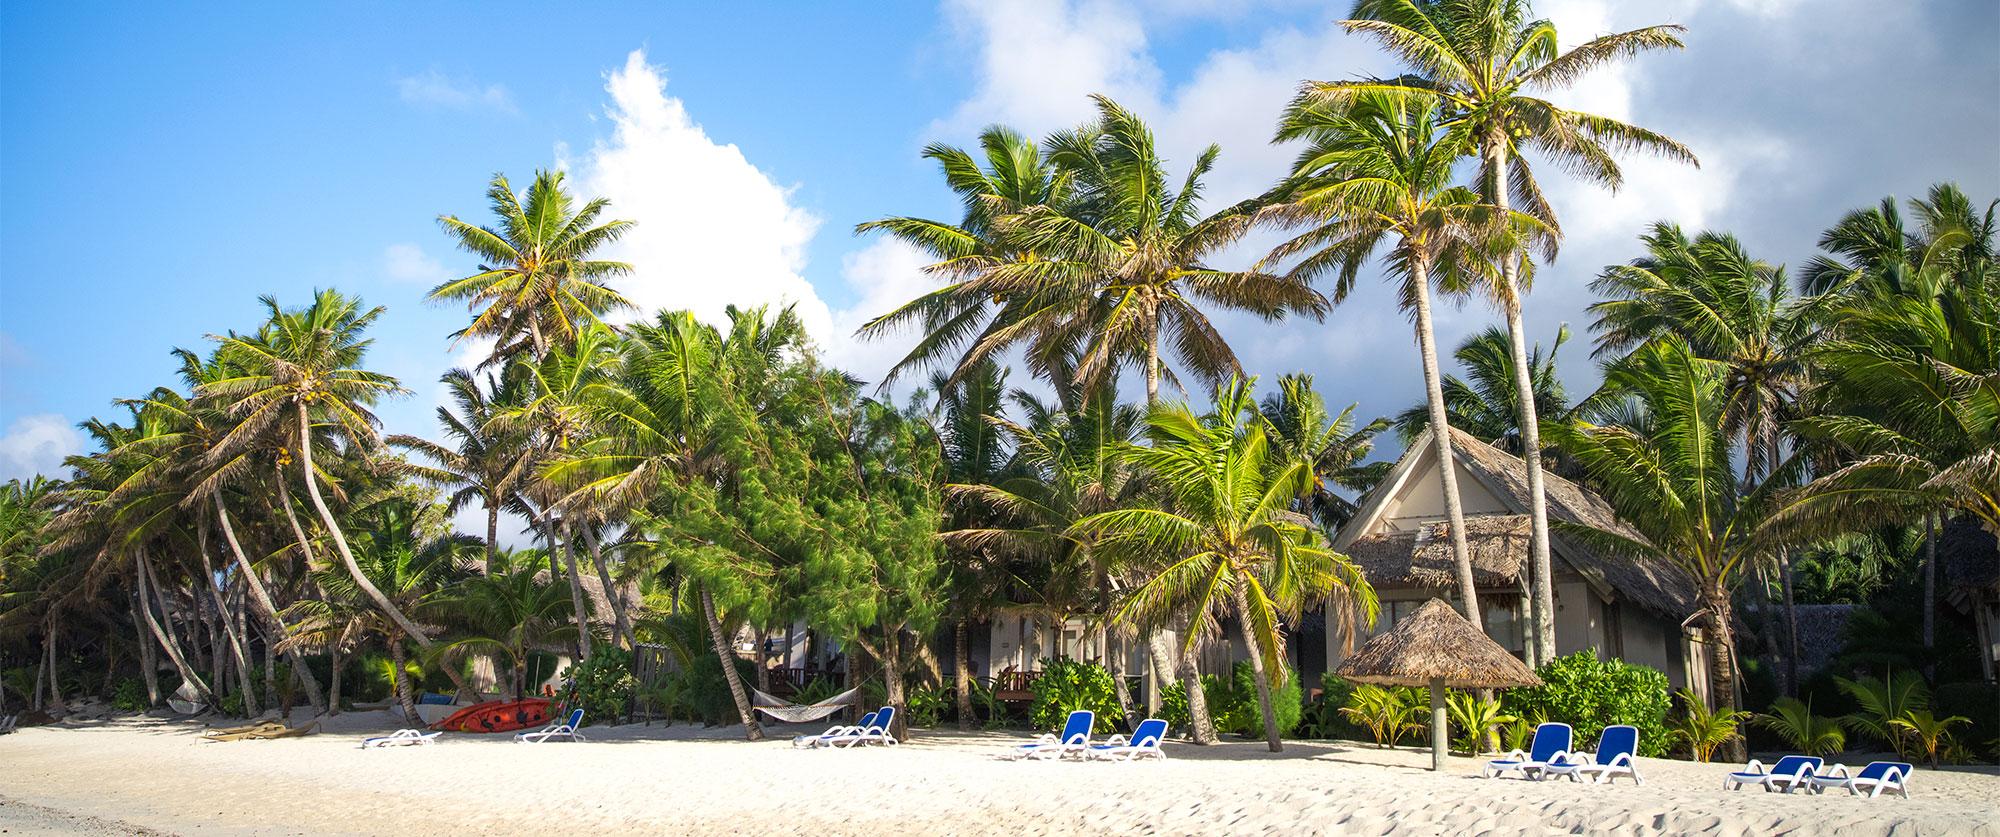 Cook Islands Overwater Bungalow Vacation - Little Polynesian Resort